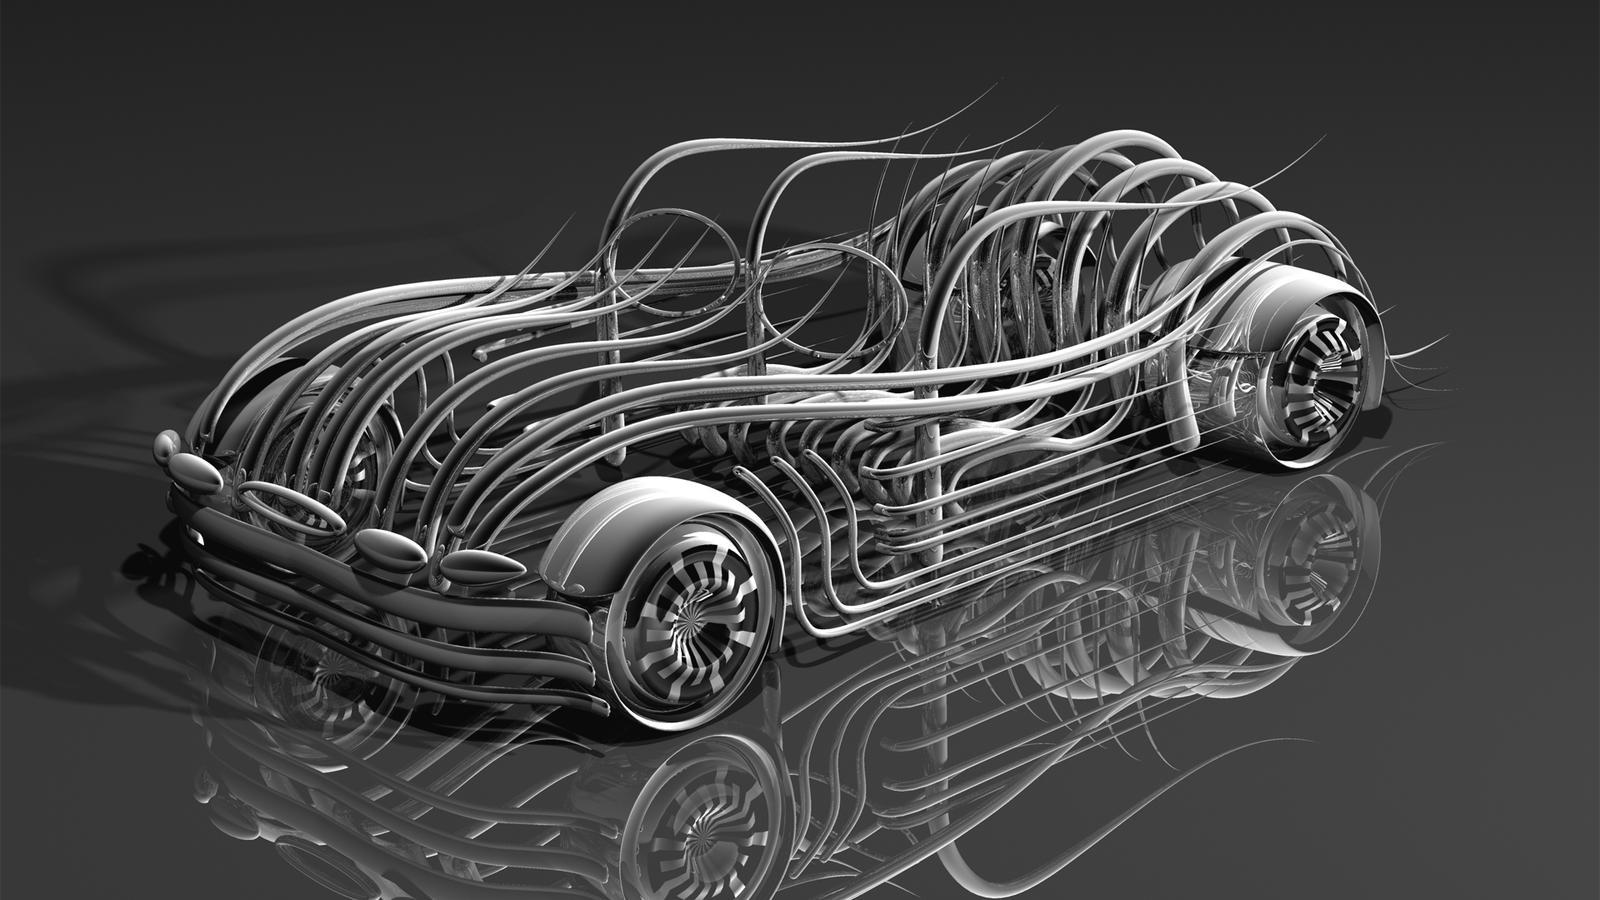 The Speedster by TylerXy